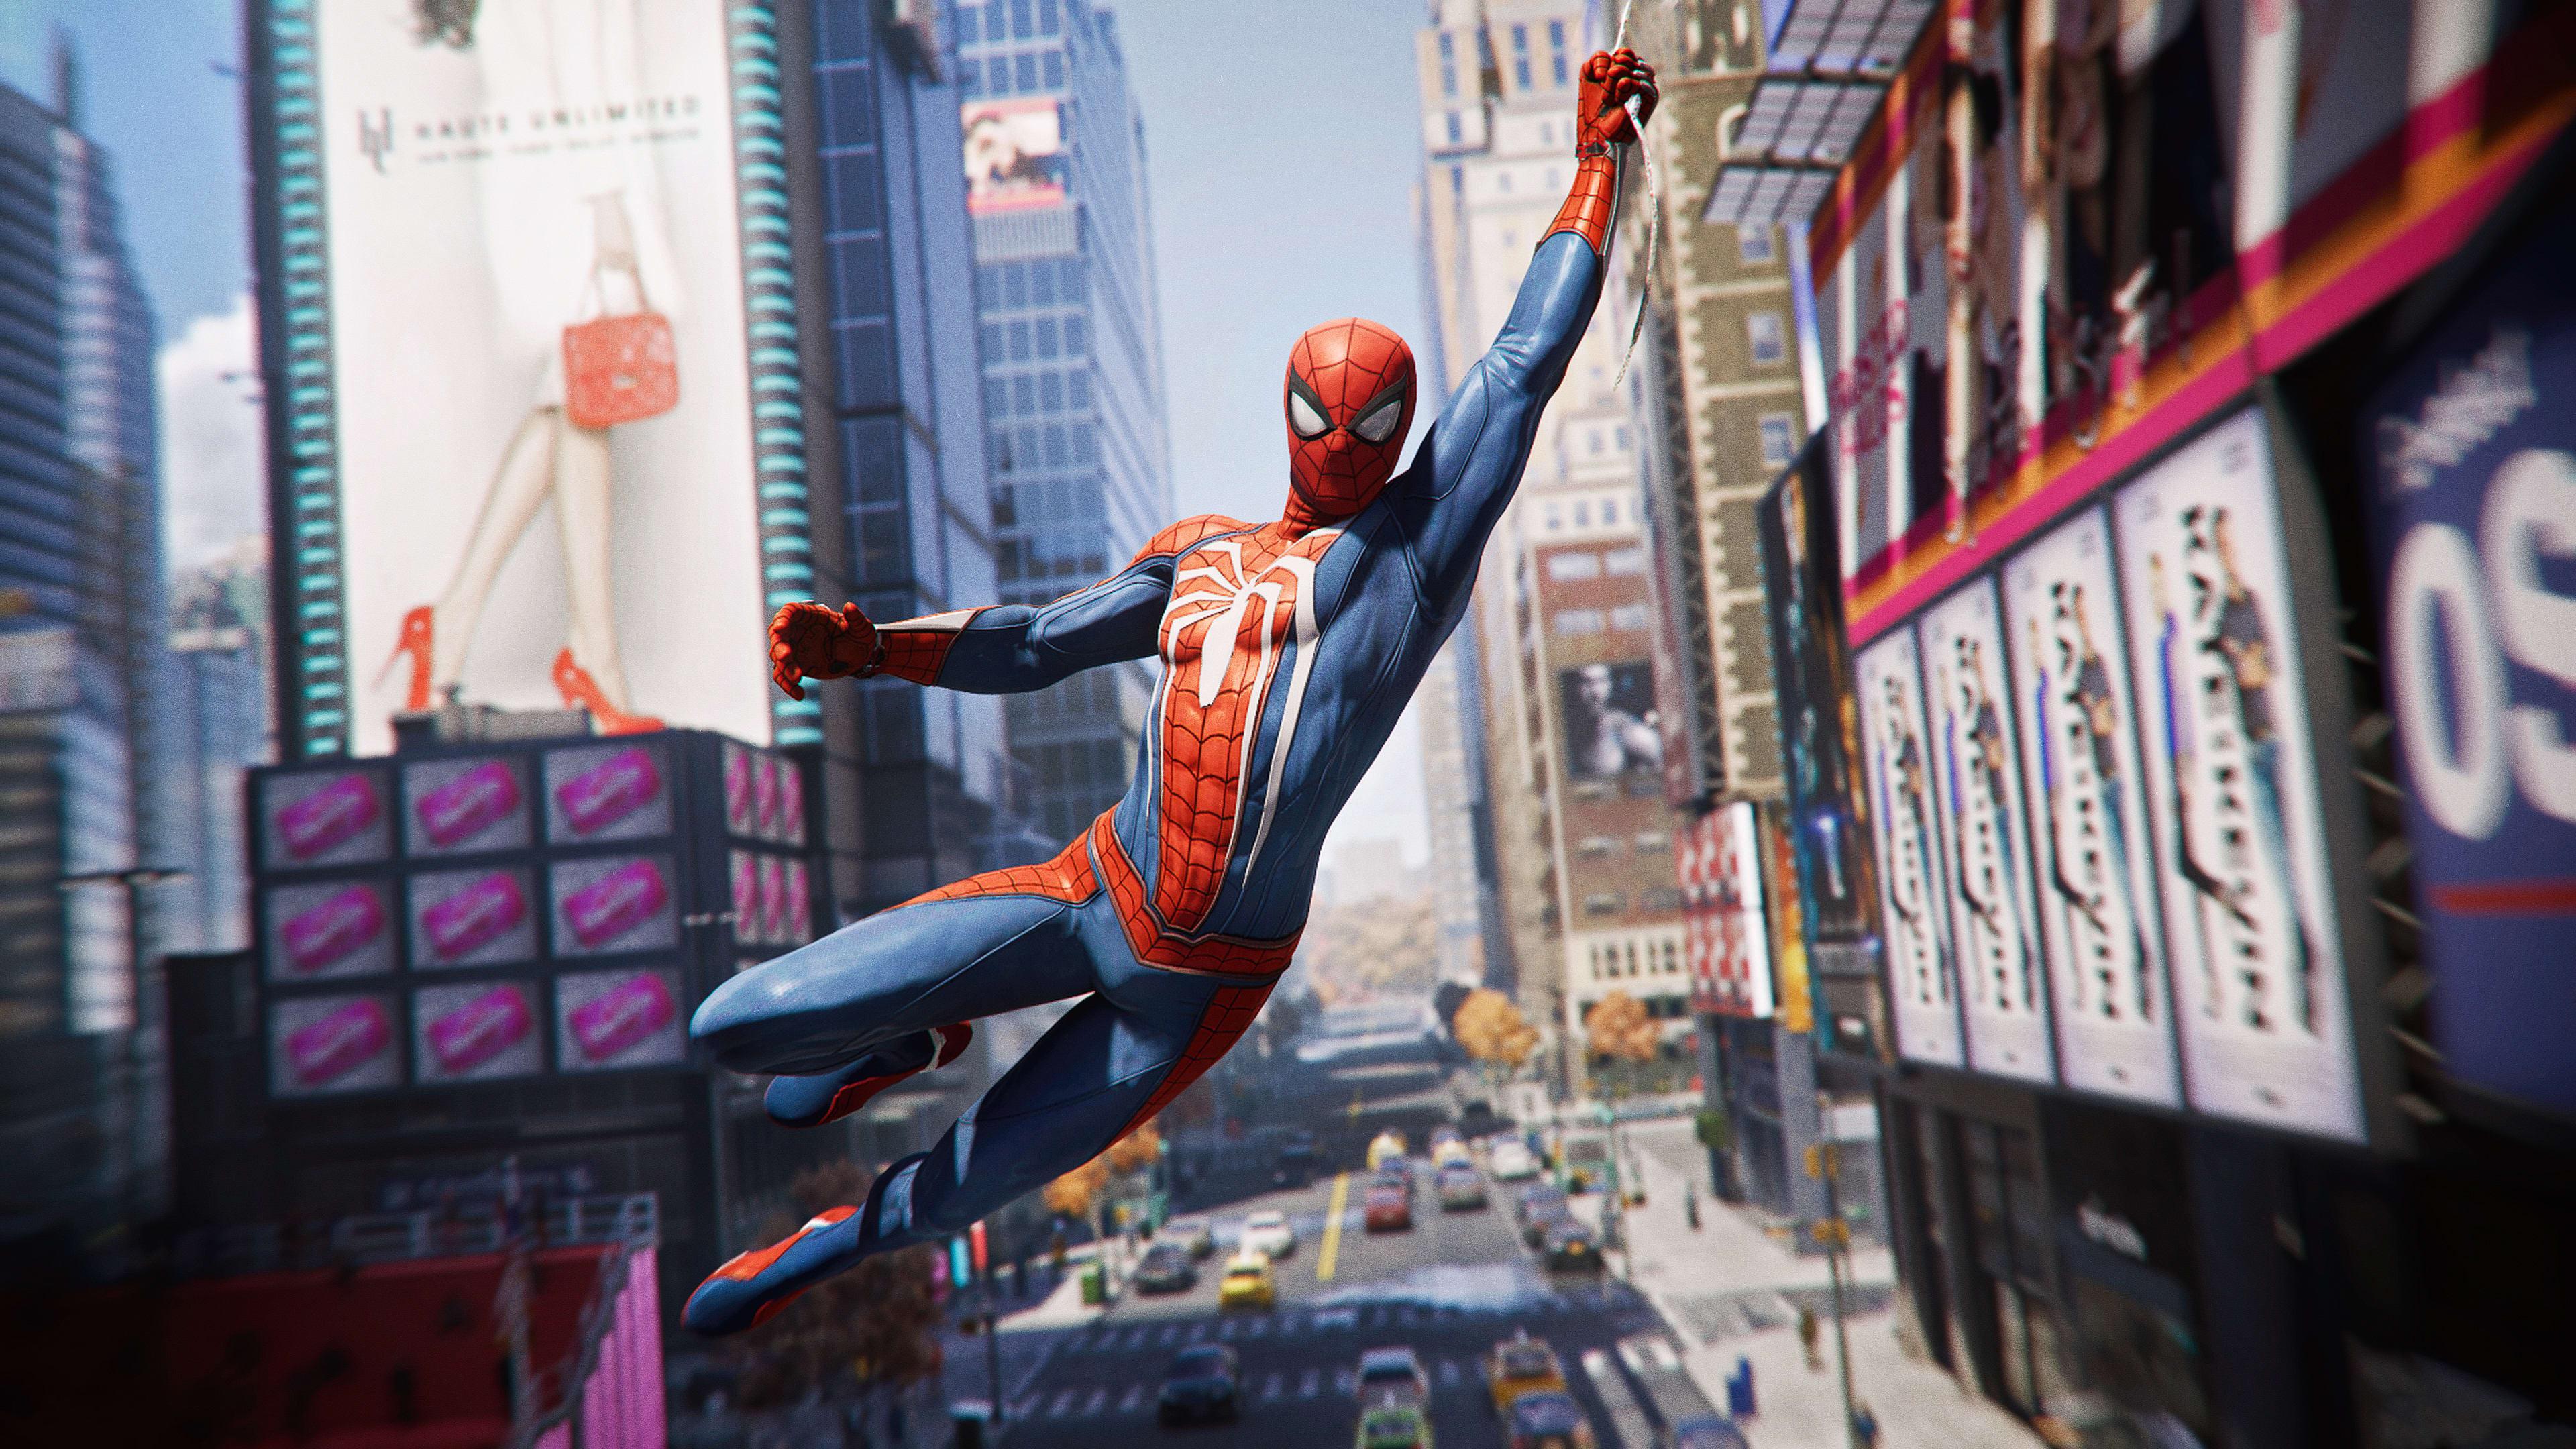 Ảnh Spider Man bay nhảy